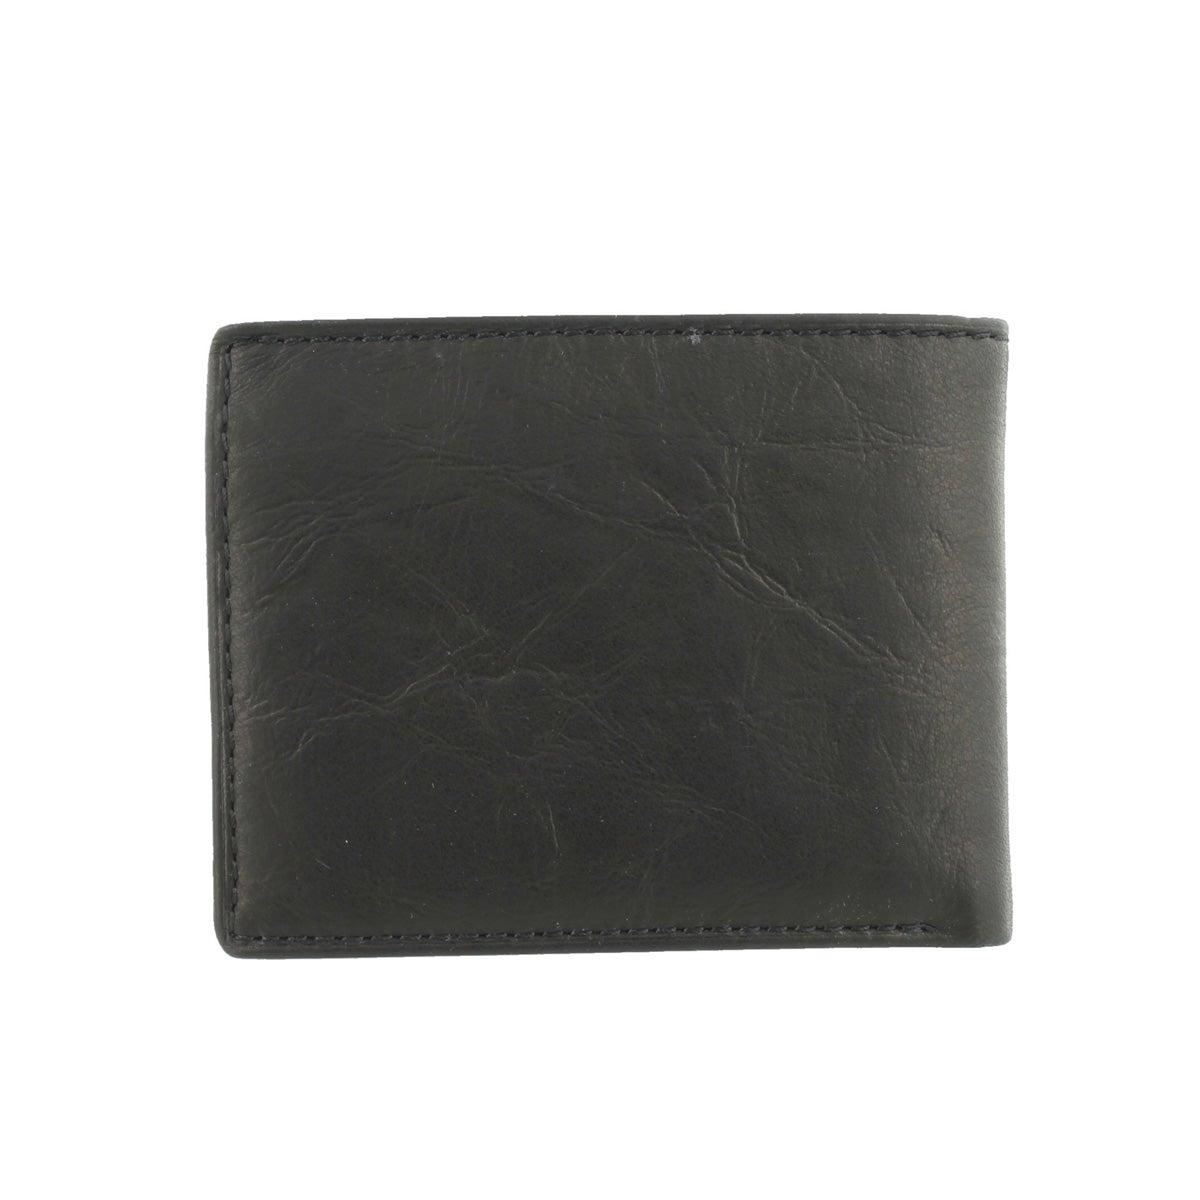 Mns Ingram Sliding 2in1 blk lthr wallet